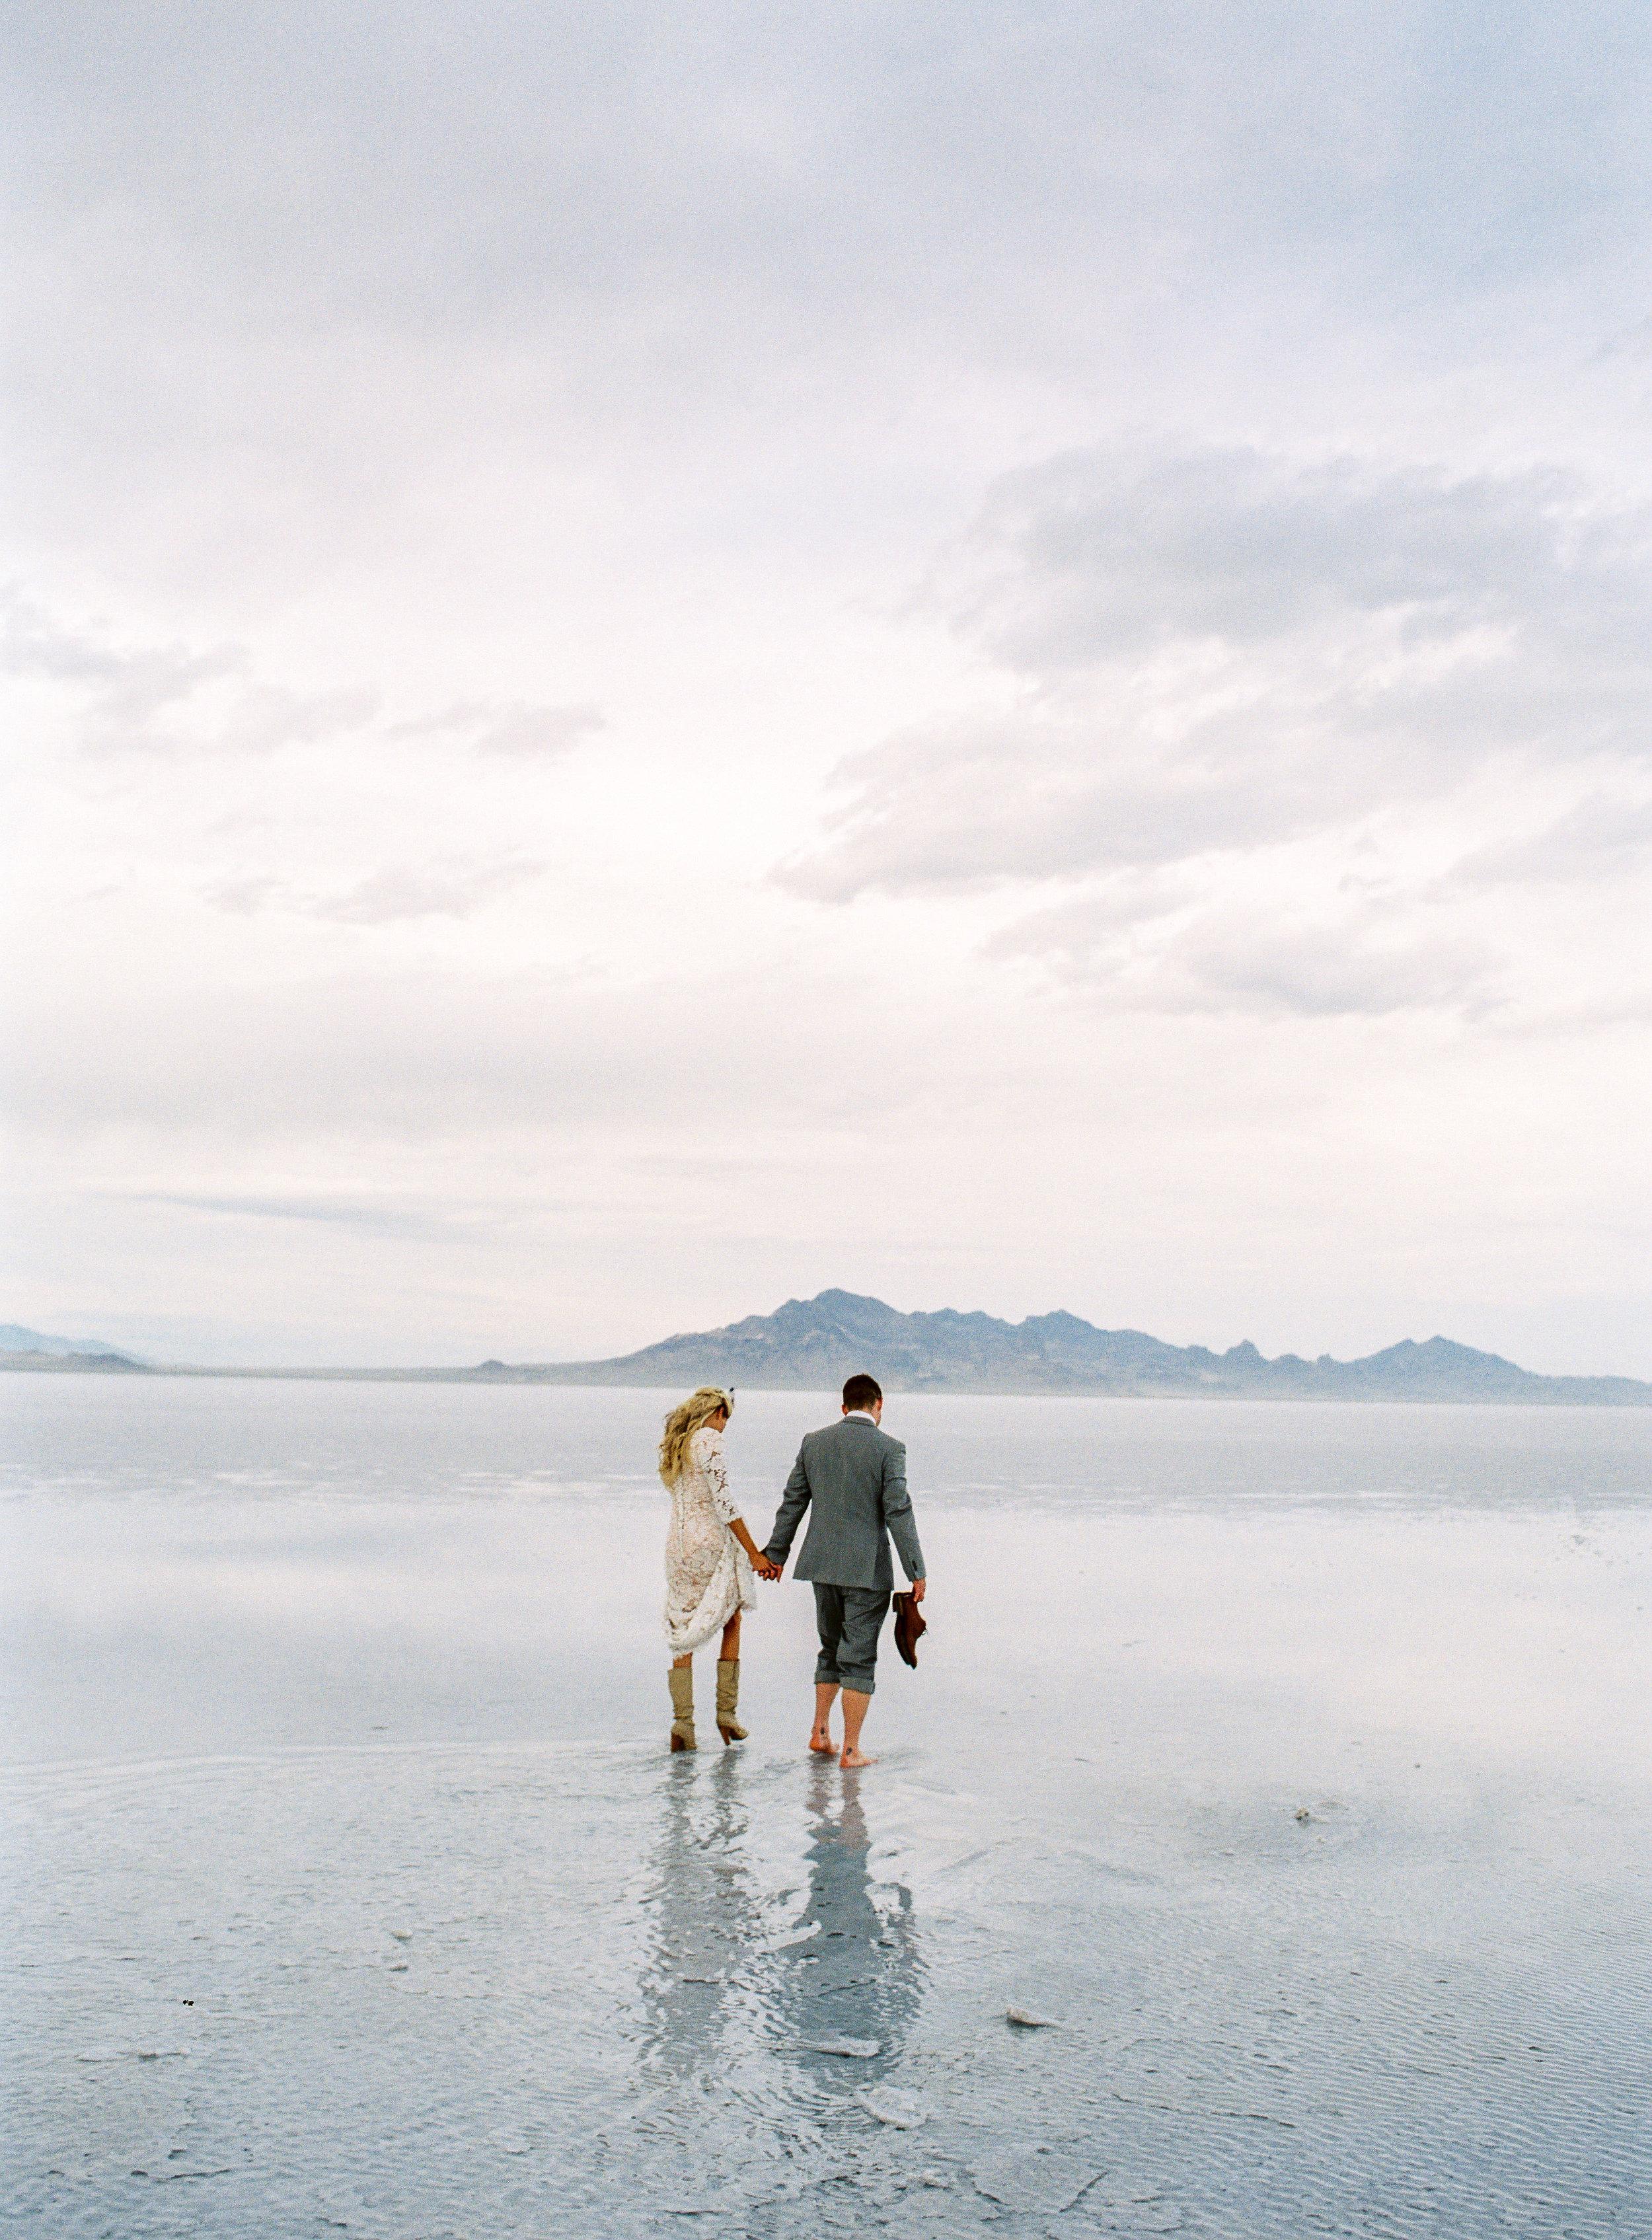 Fuji 400h fine art film photographer bonneville salt flats bridals utah